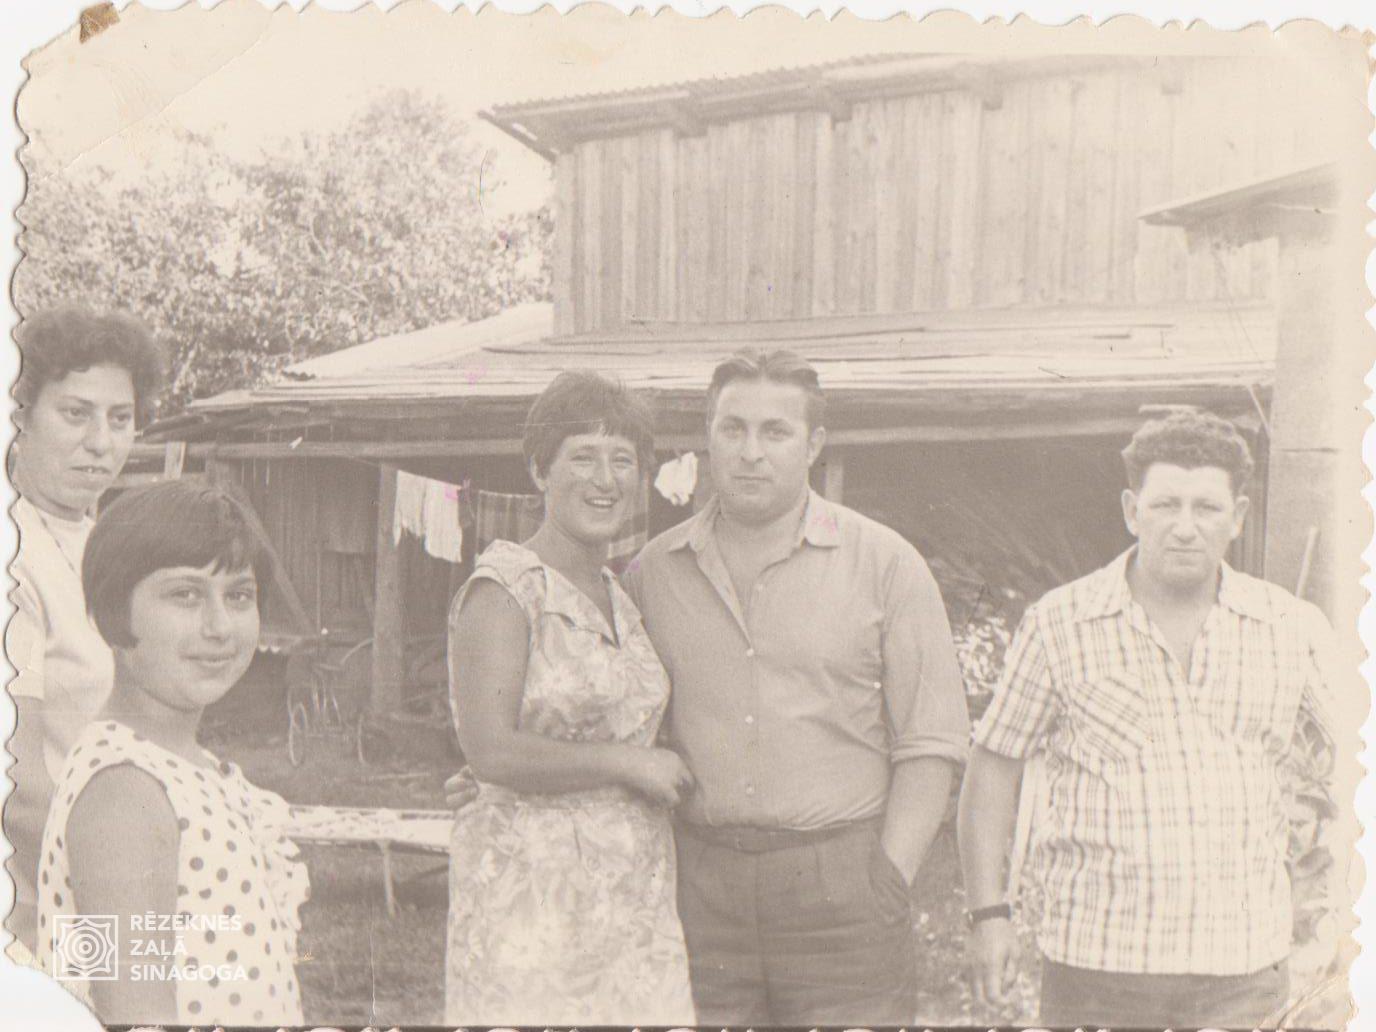 Jeruhovič Hava, Sapožnikova Maija, Sapožnikovs Haims, Veismans Goga